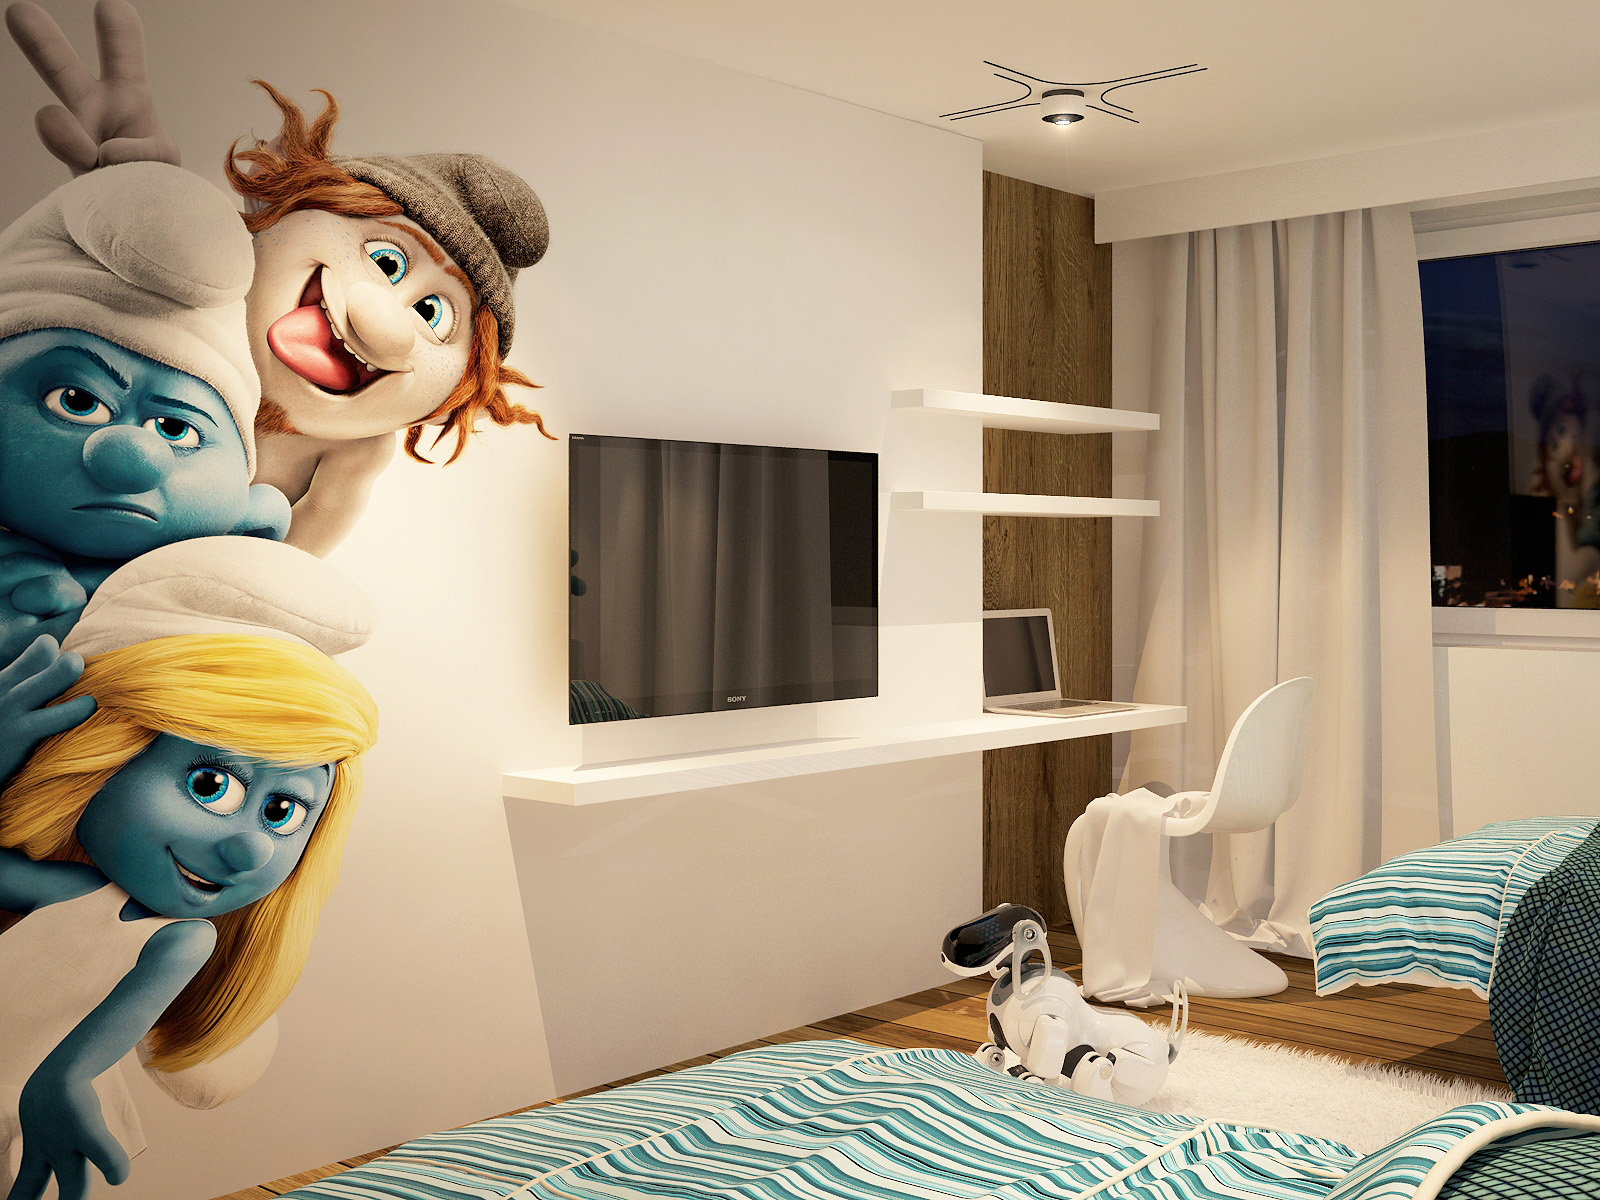 Smurf wall decor